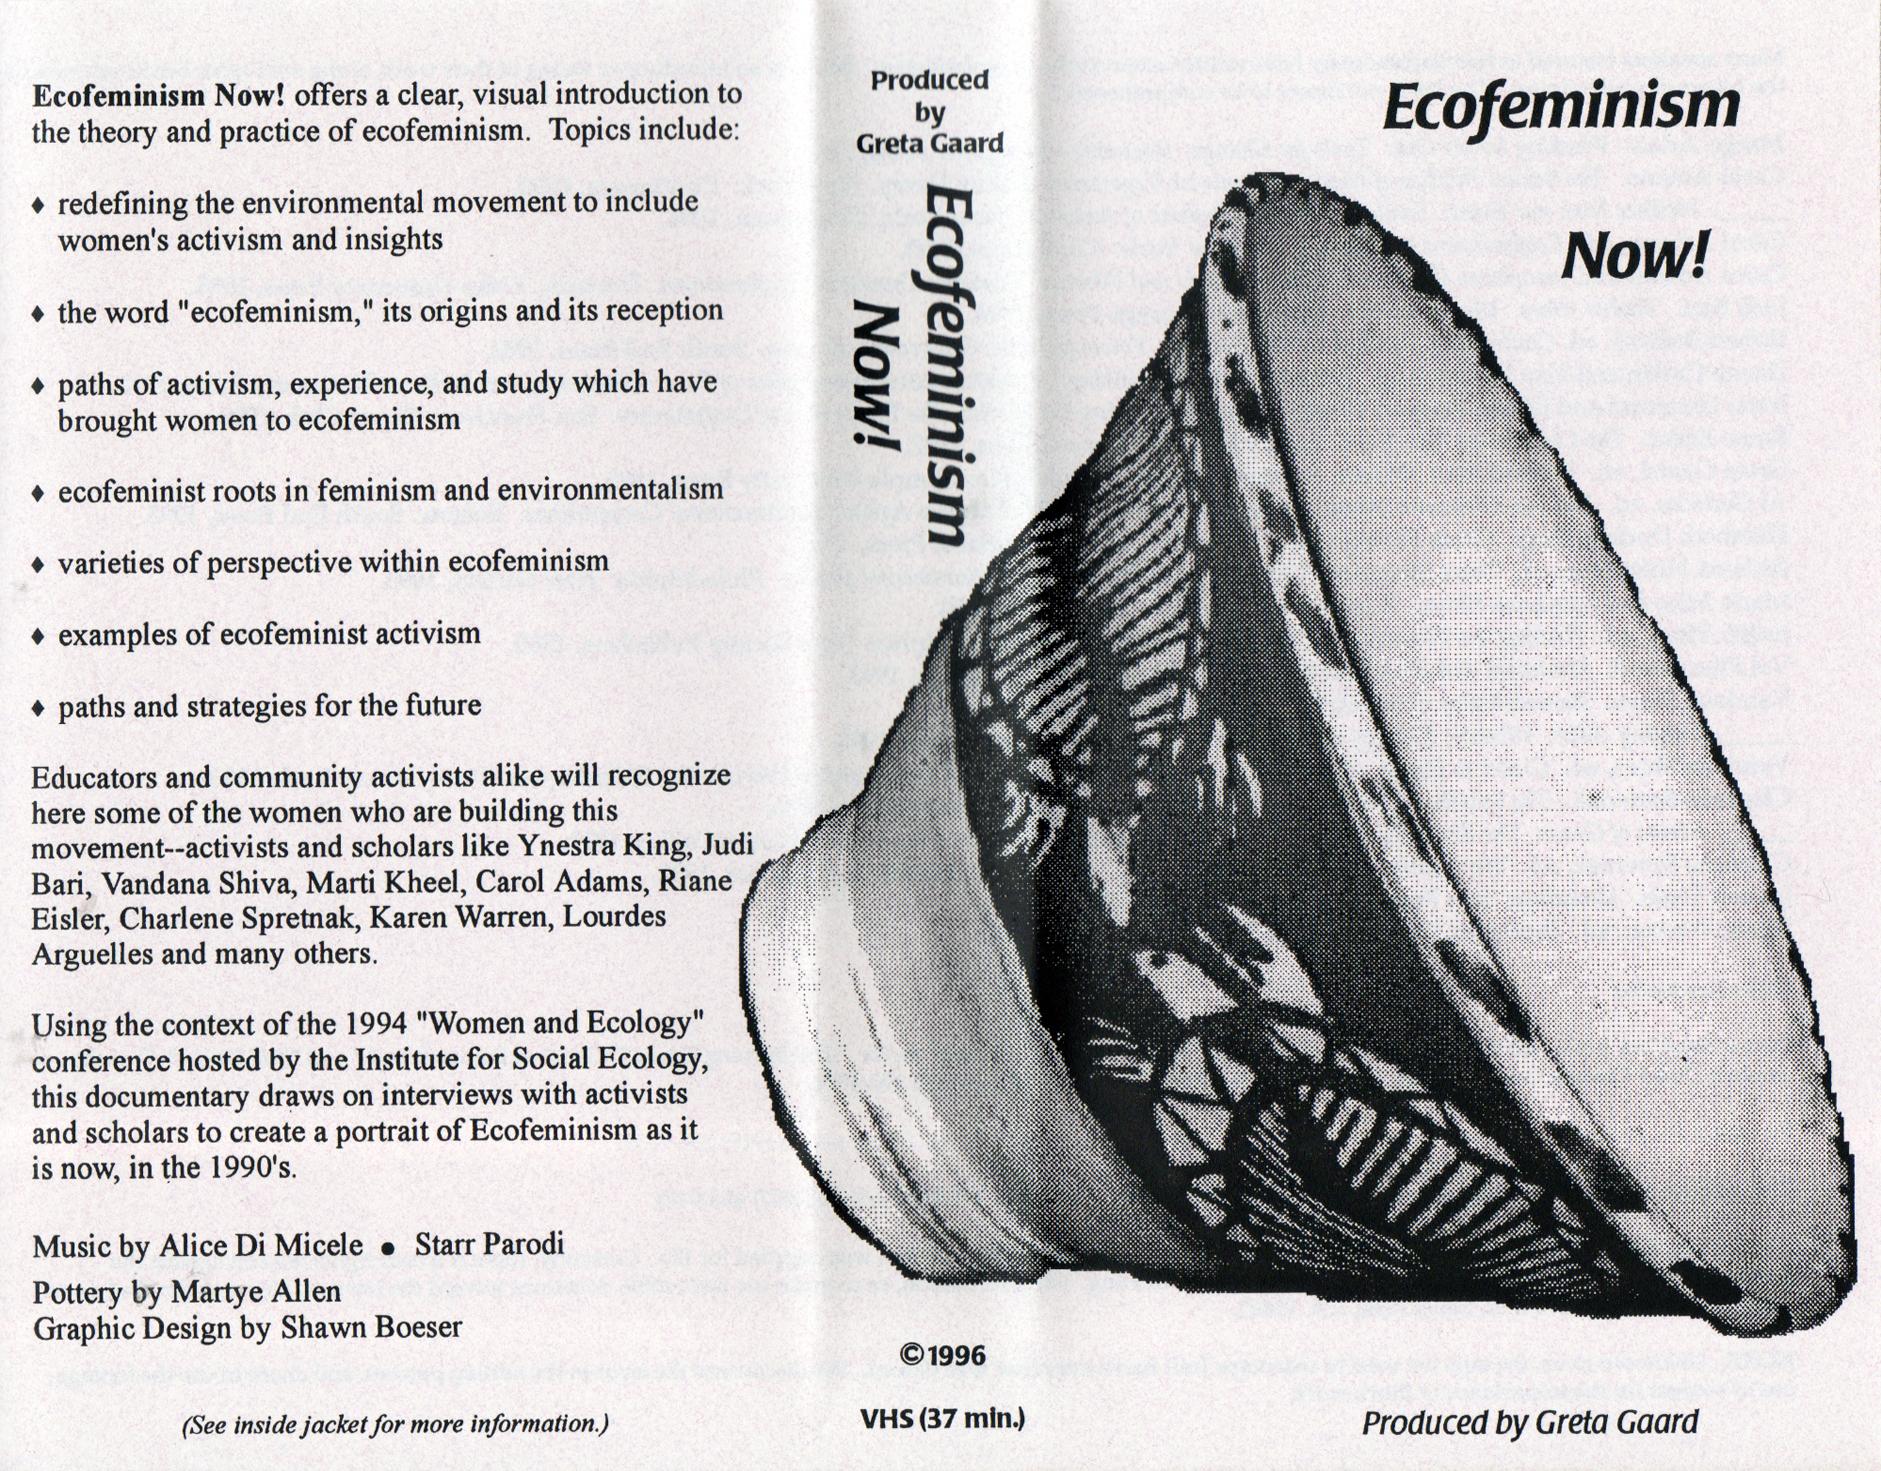 the idea of ecofeminism in america according to karen warren